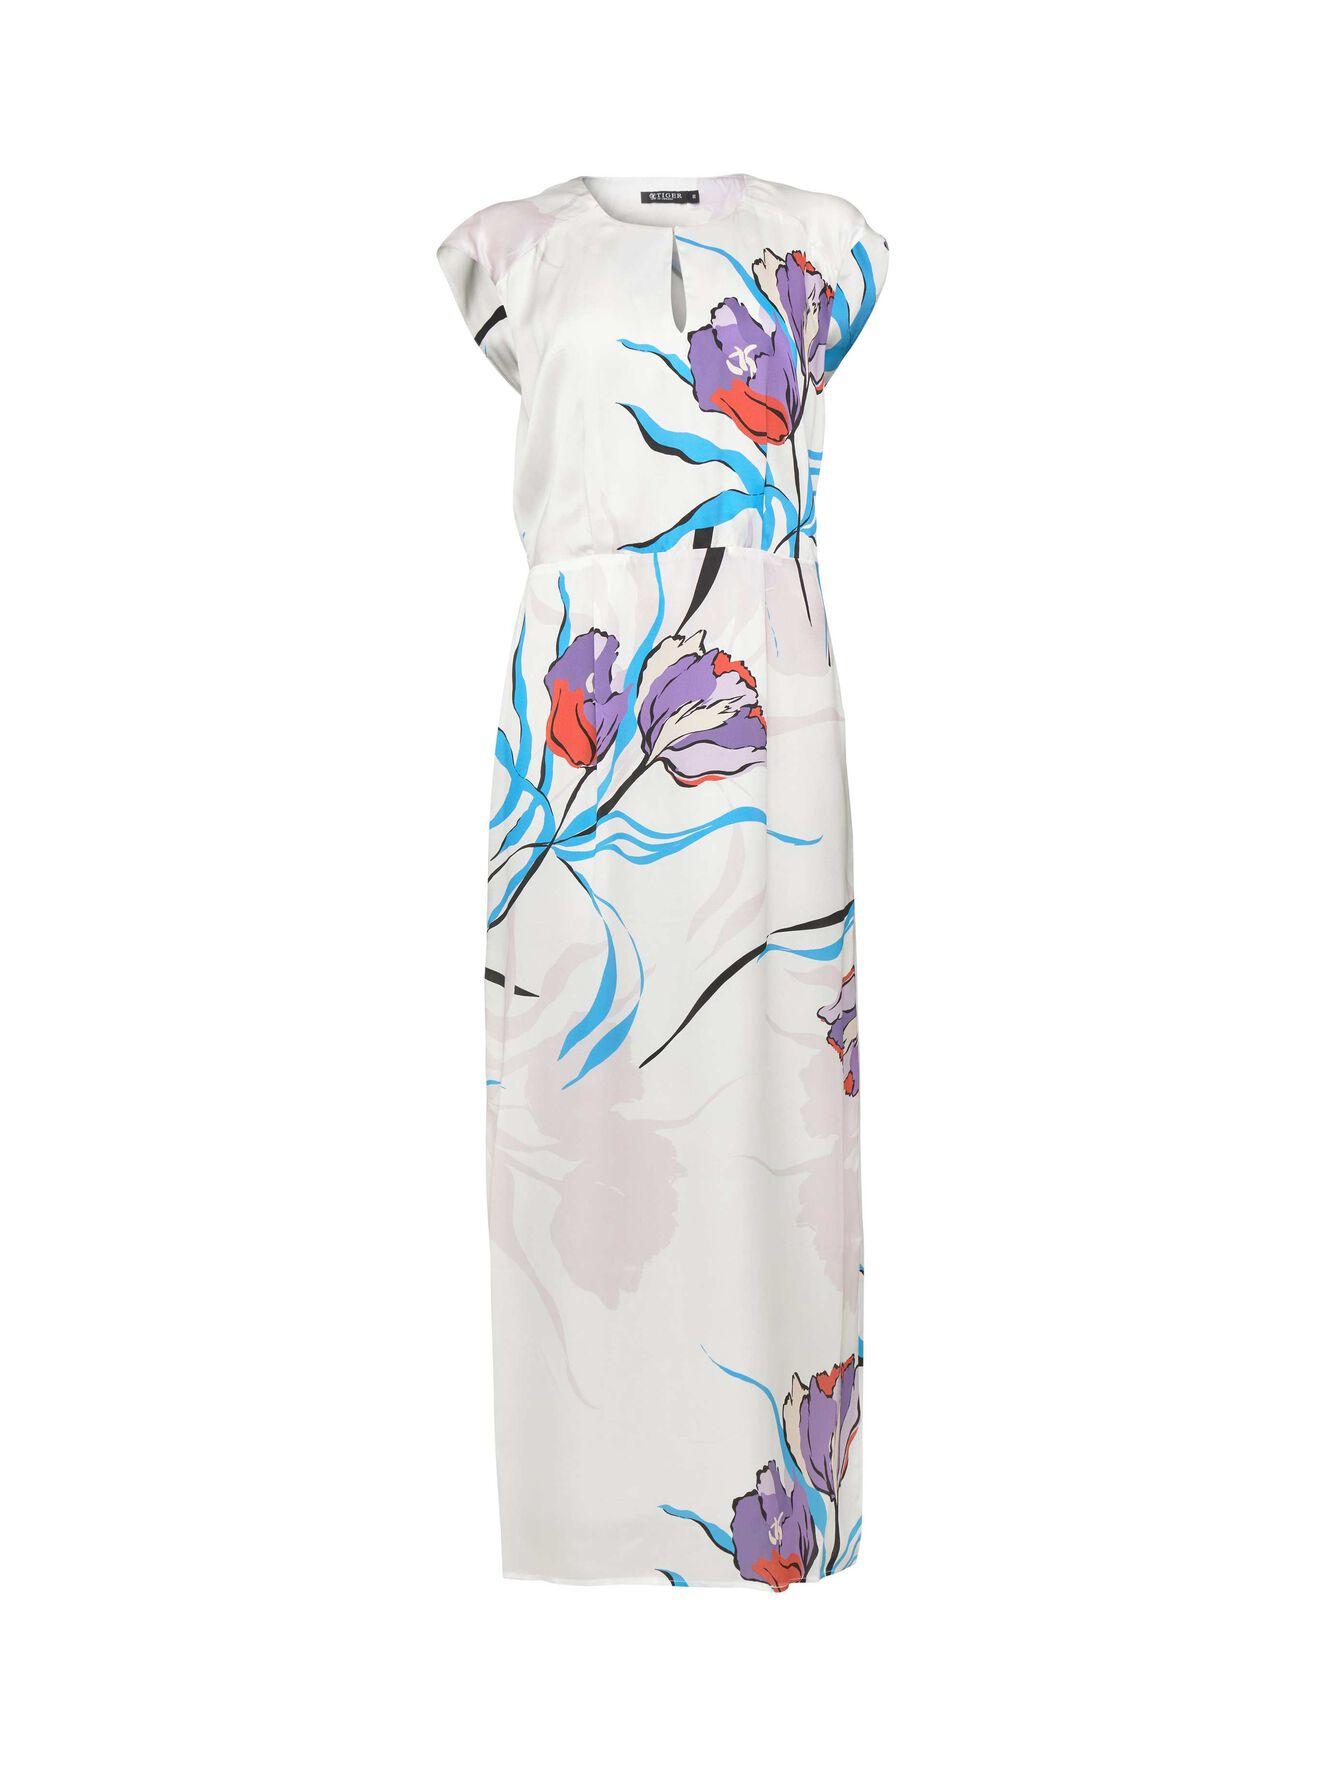 Agave Pri Dress in ARTWORK from Tiger of Sweden